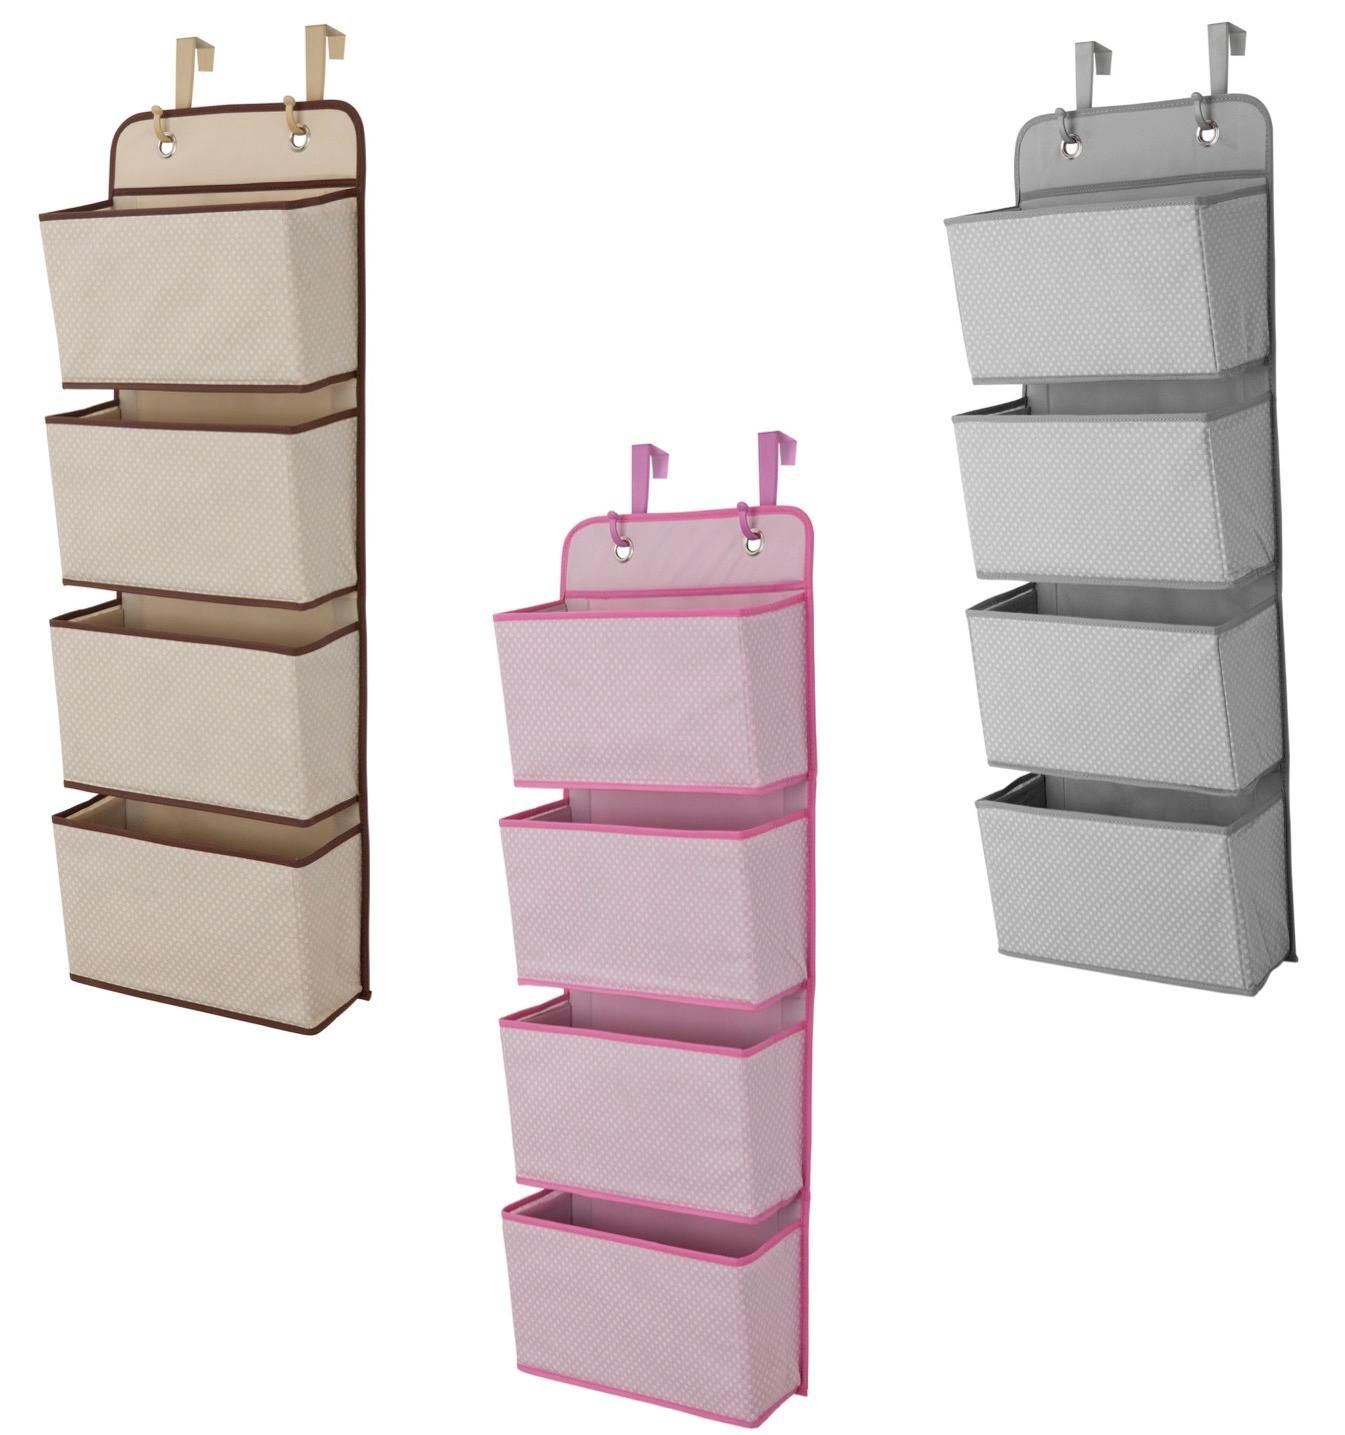 Elegant Nursery, Storage, Over, The, Door, Hanging, Organizer, Space, Saving, Pink,  Beige, Tan, Grey, Gray